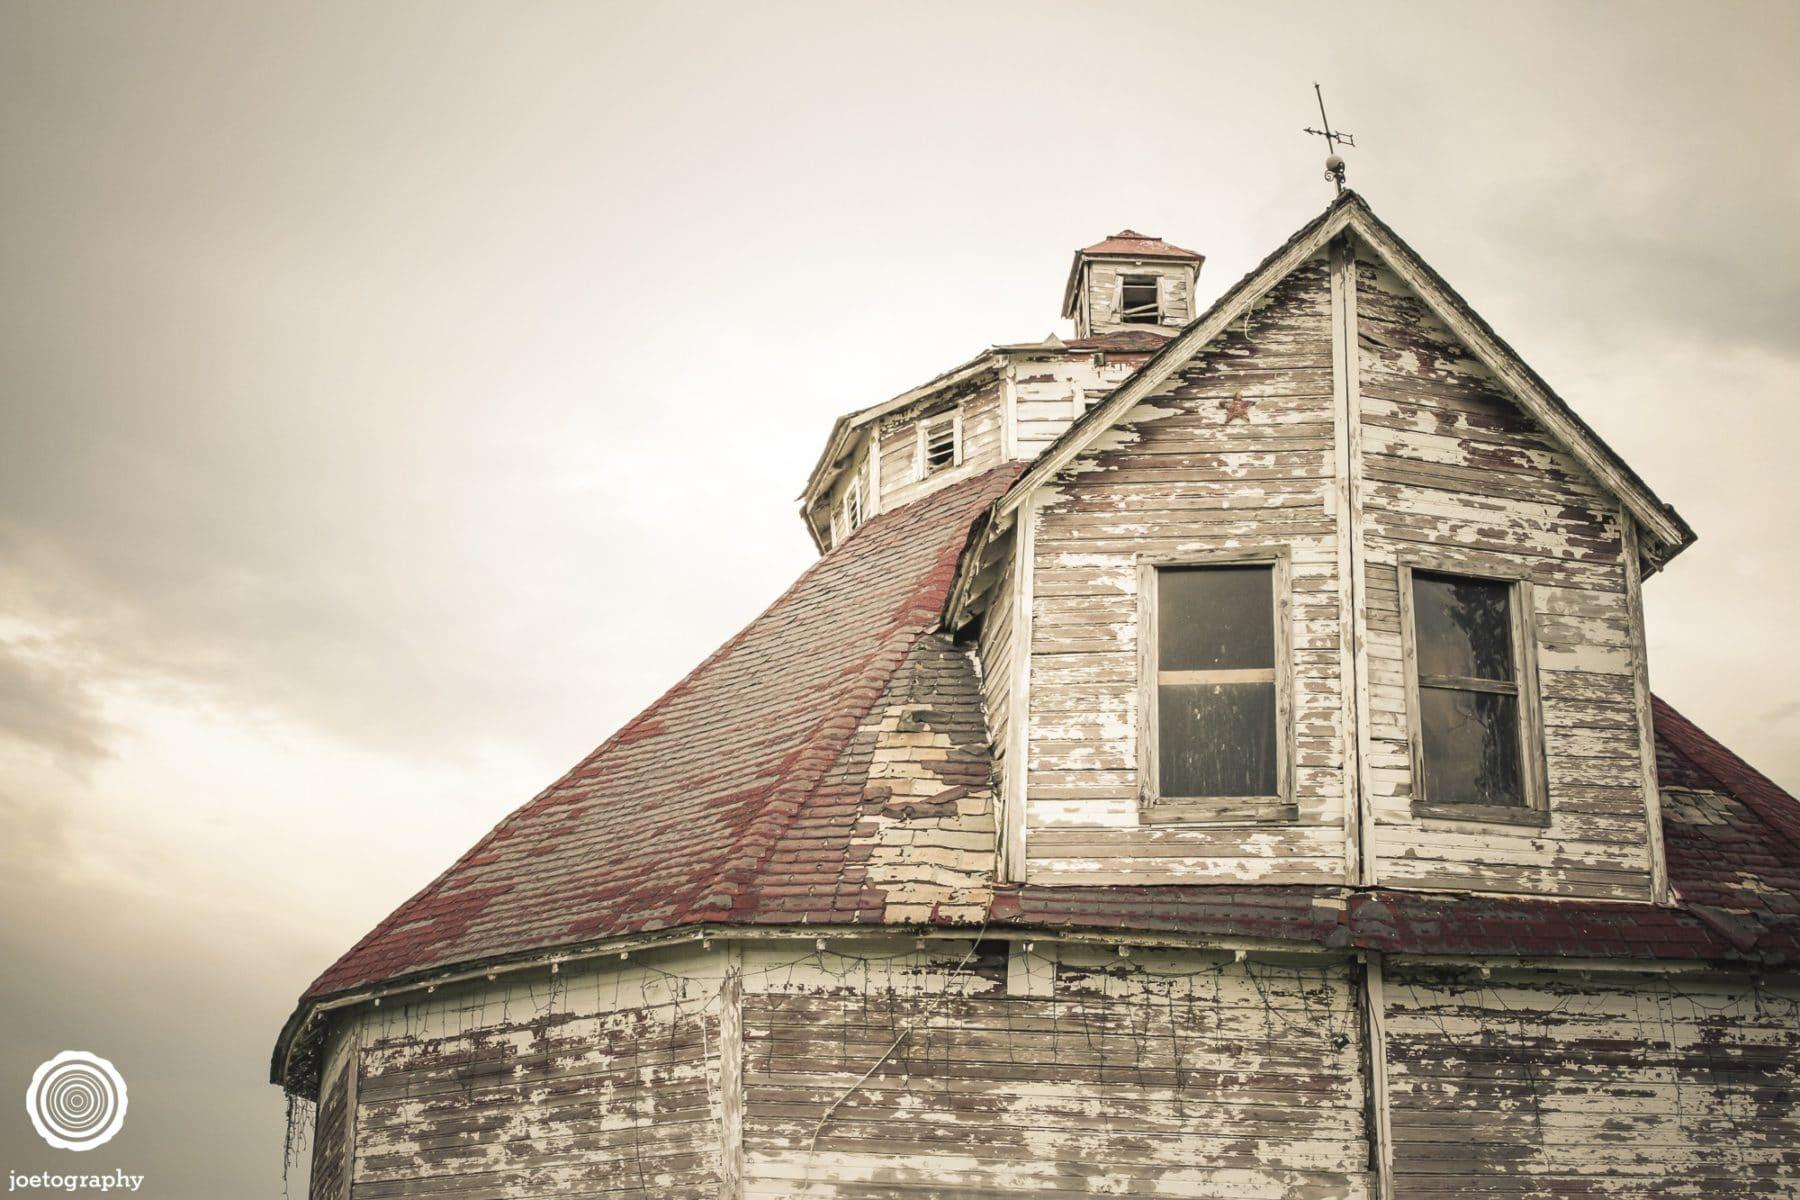 polygonal-barn-architecture-photos-shelbyville-indiana-6